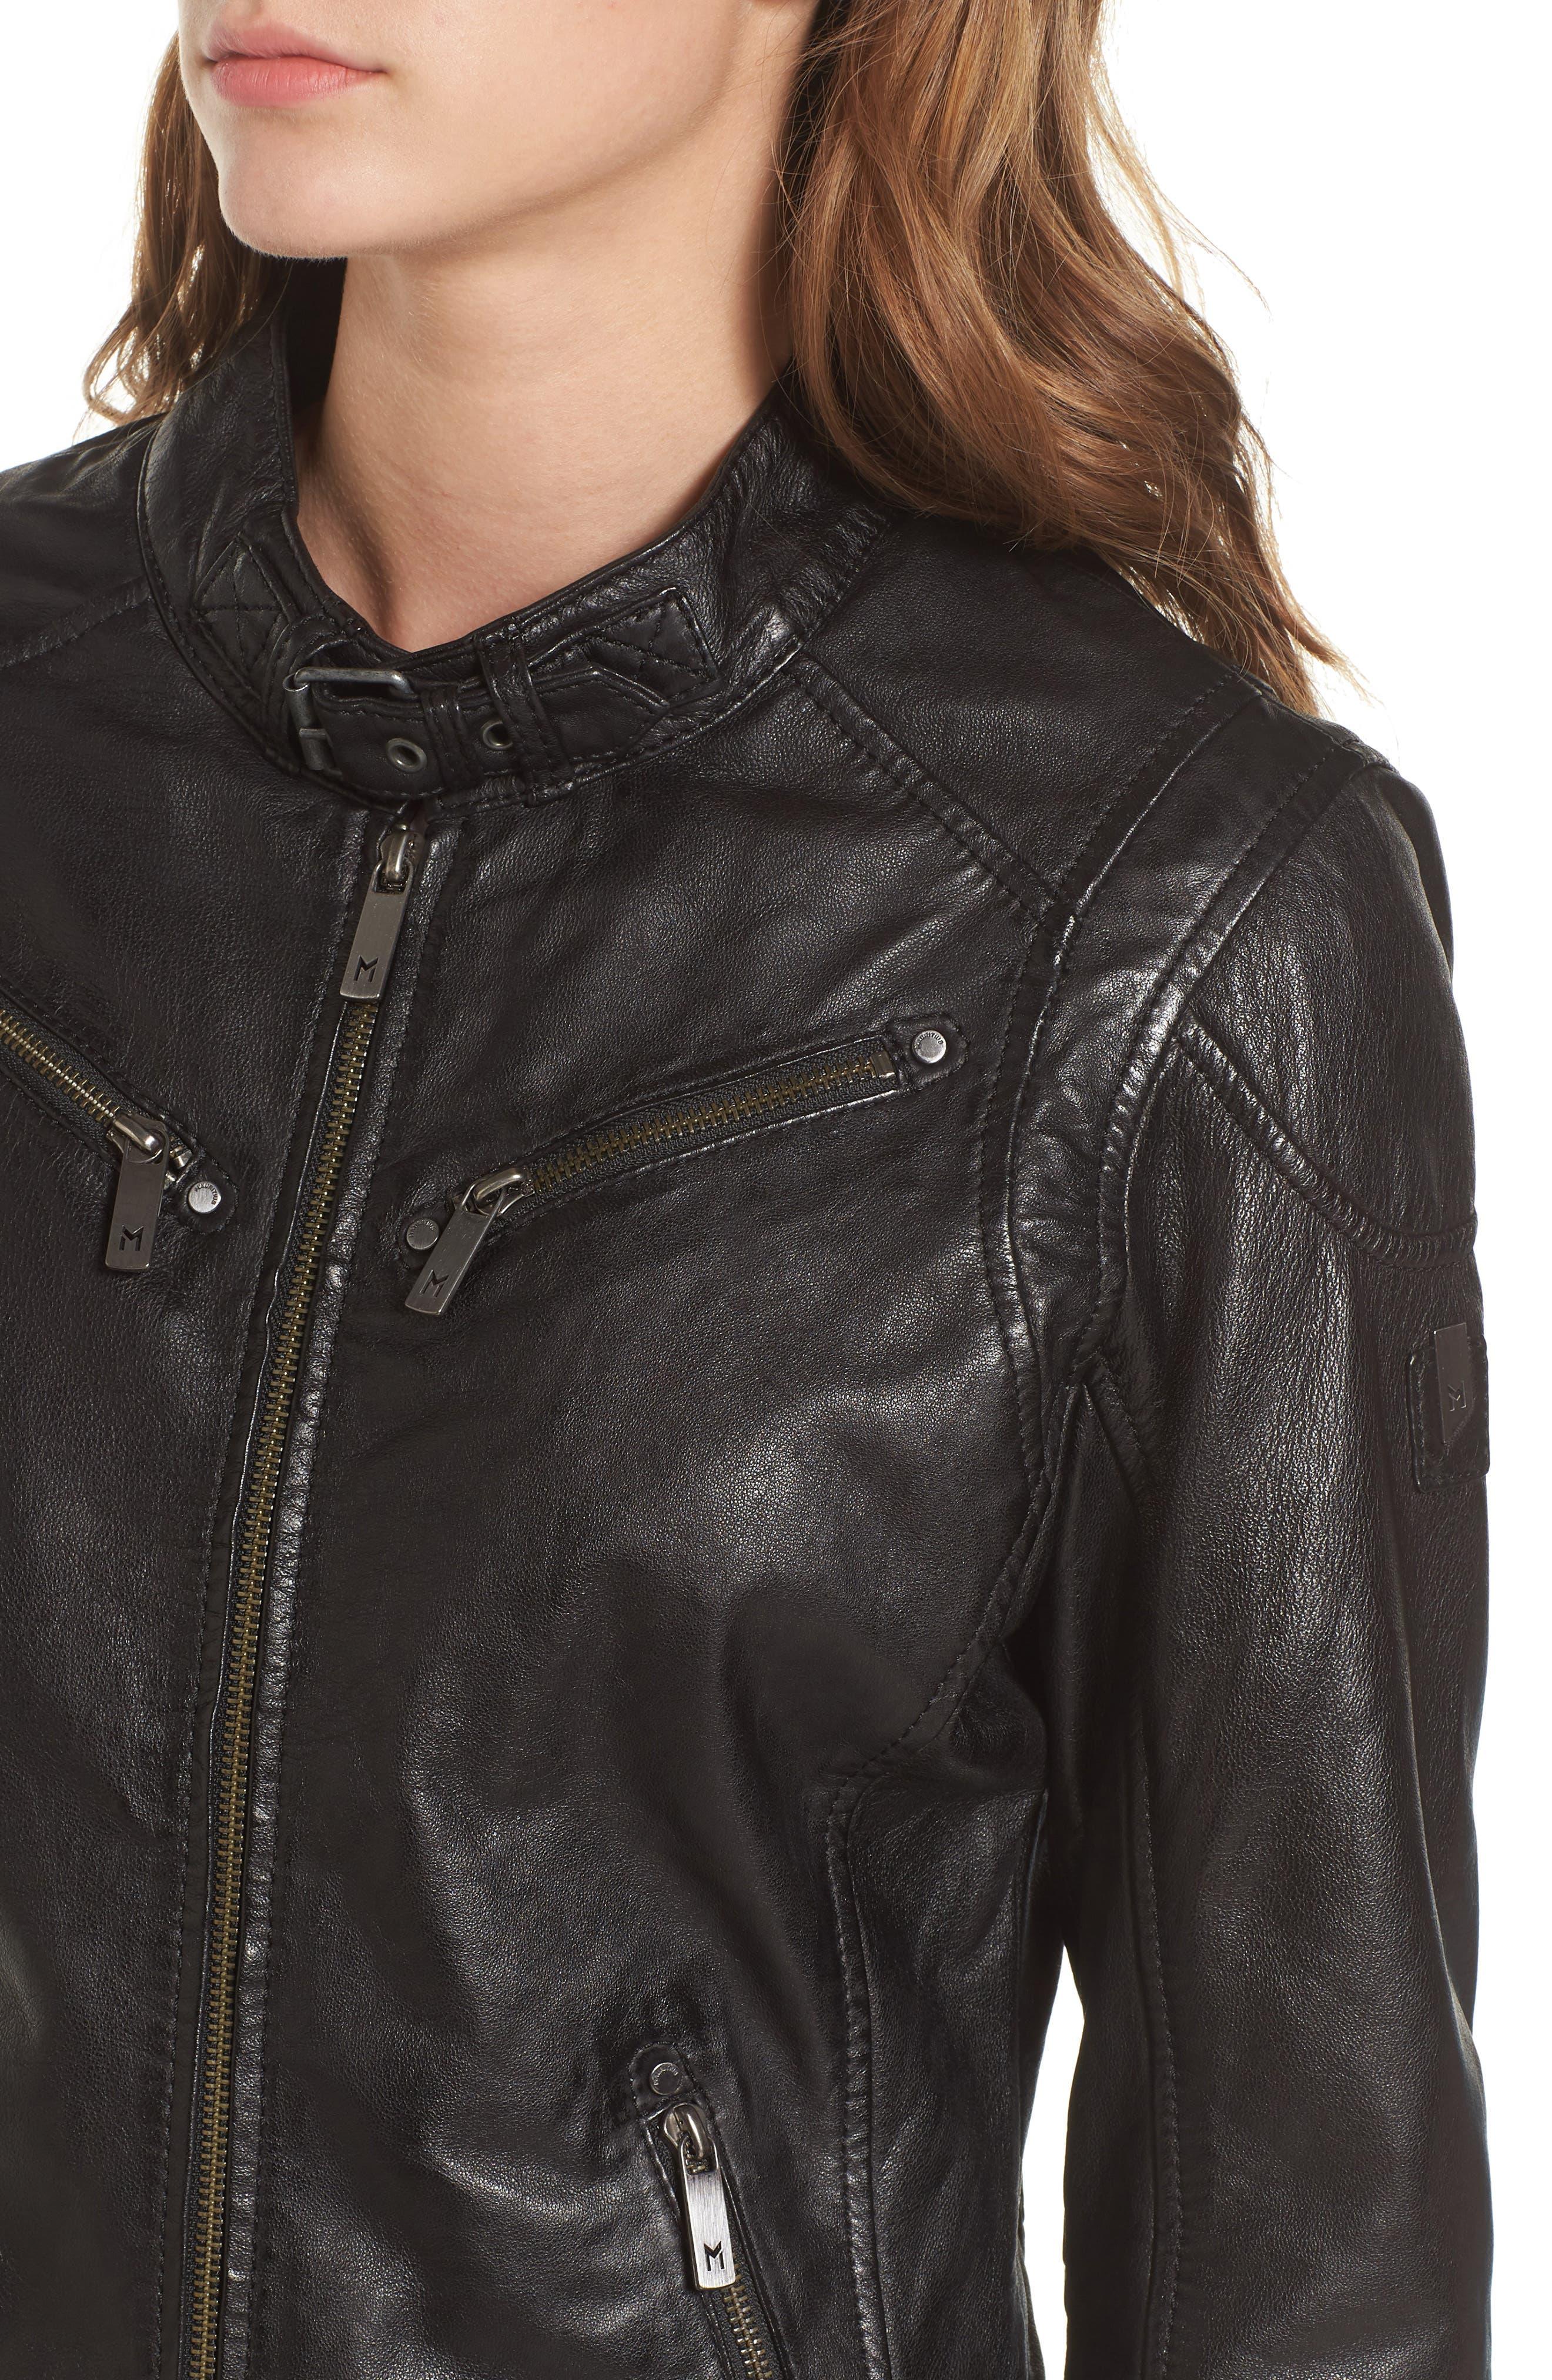 MAURITIUS, Leather Lambskin Leather Moto Jacket, Alternate thumbnail 4, color, 001